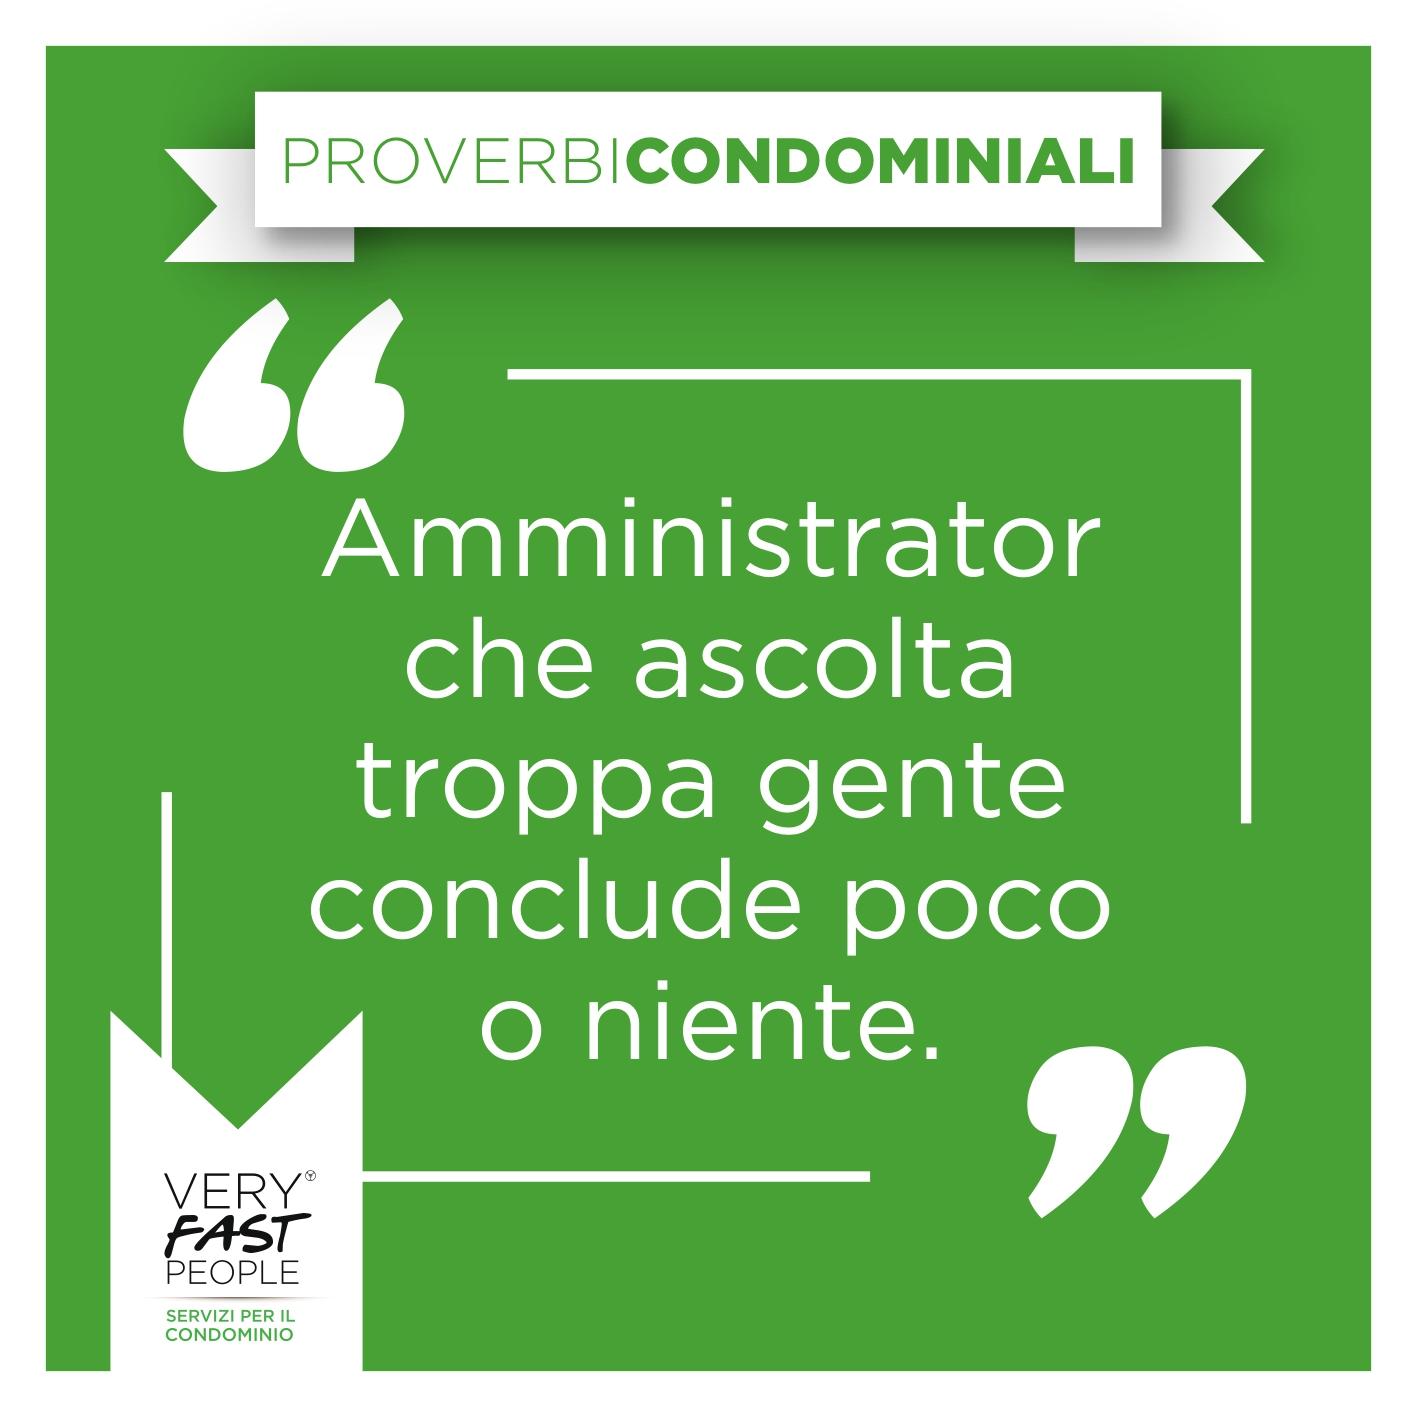 Proverbi condominiali